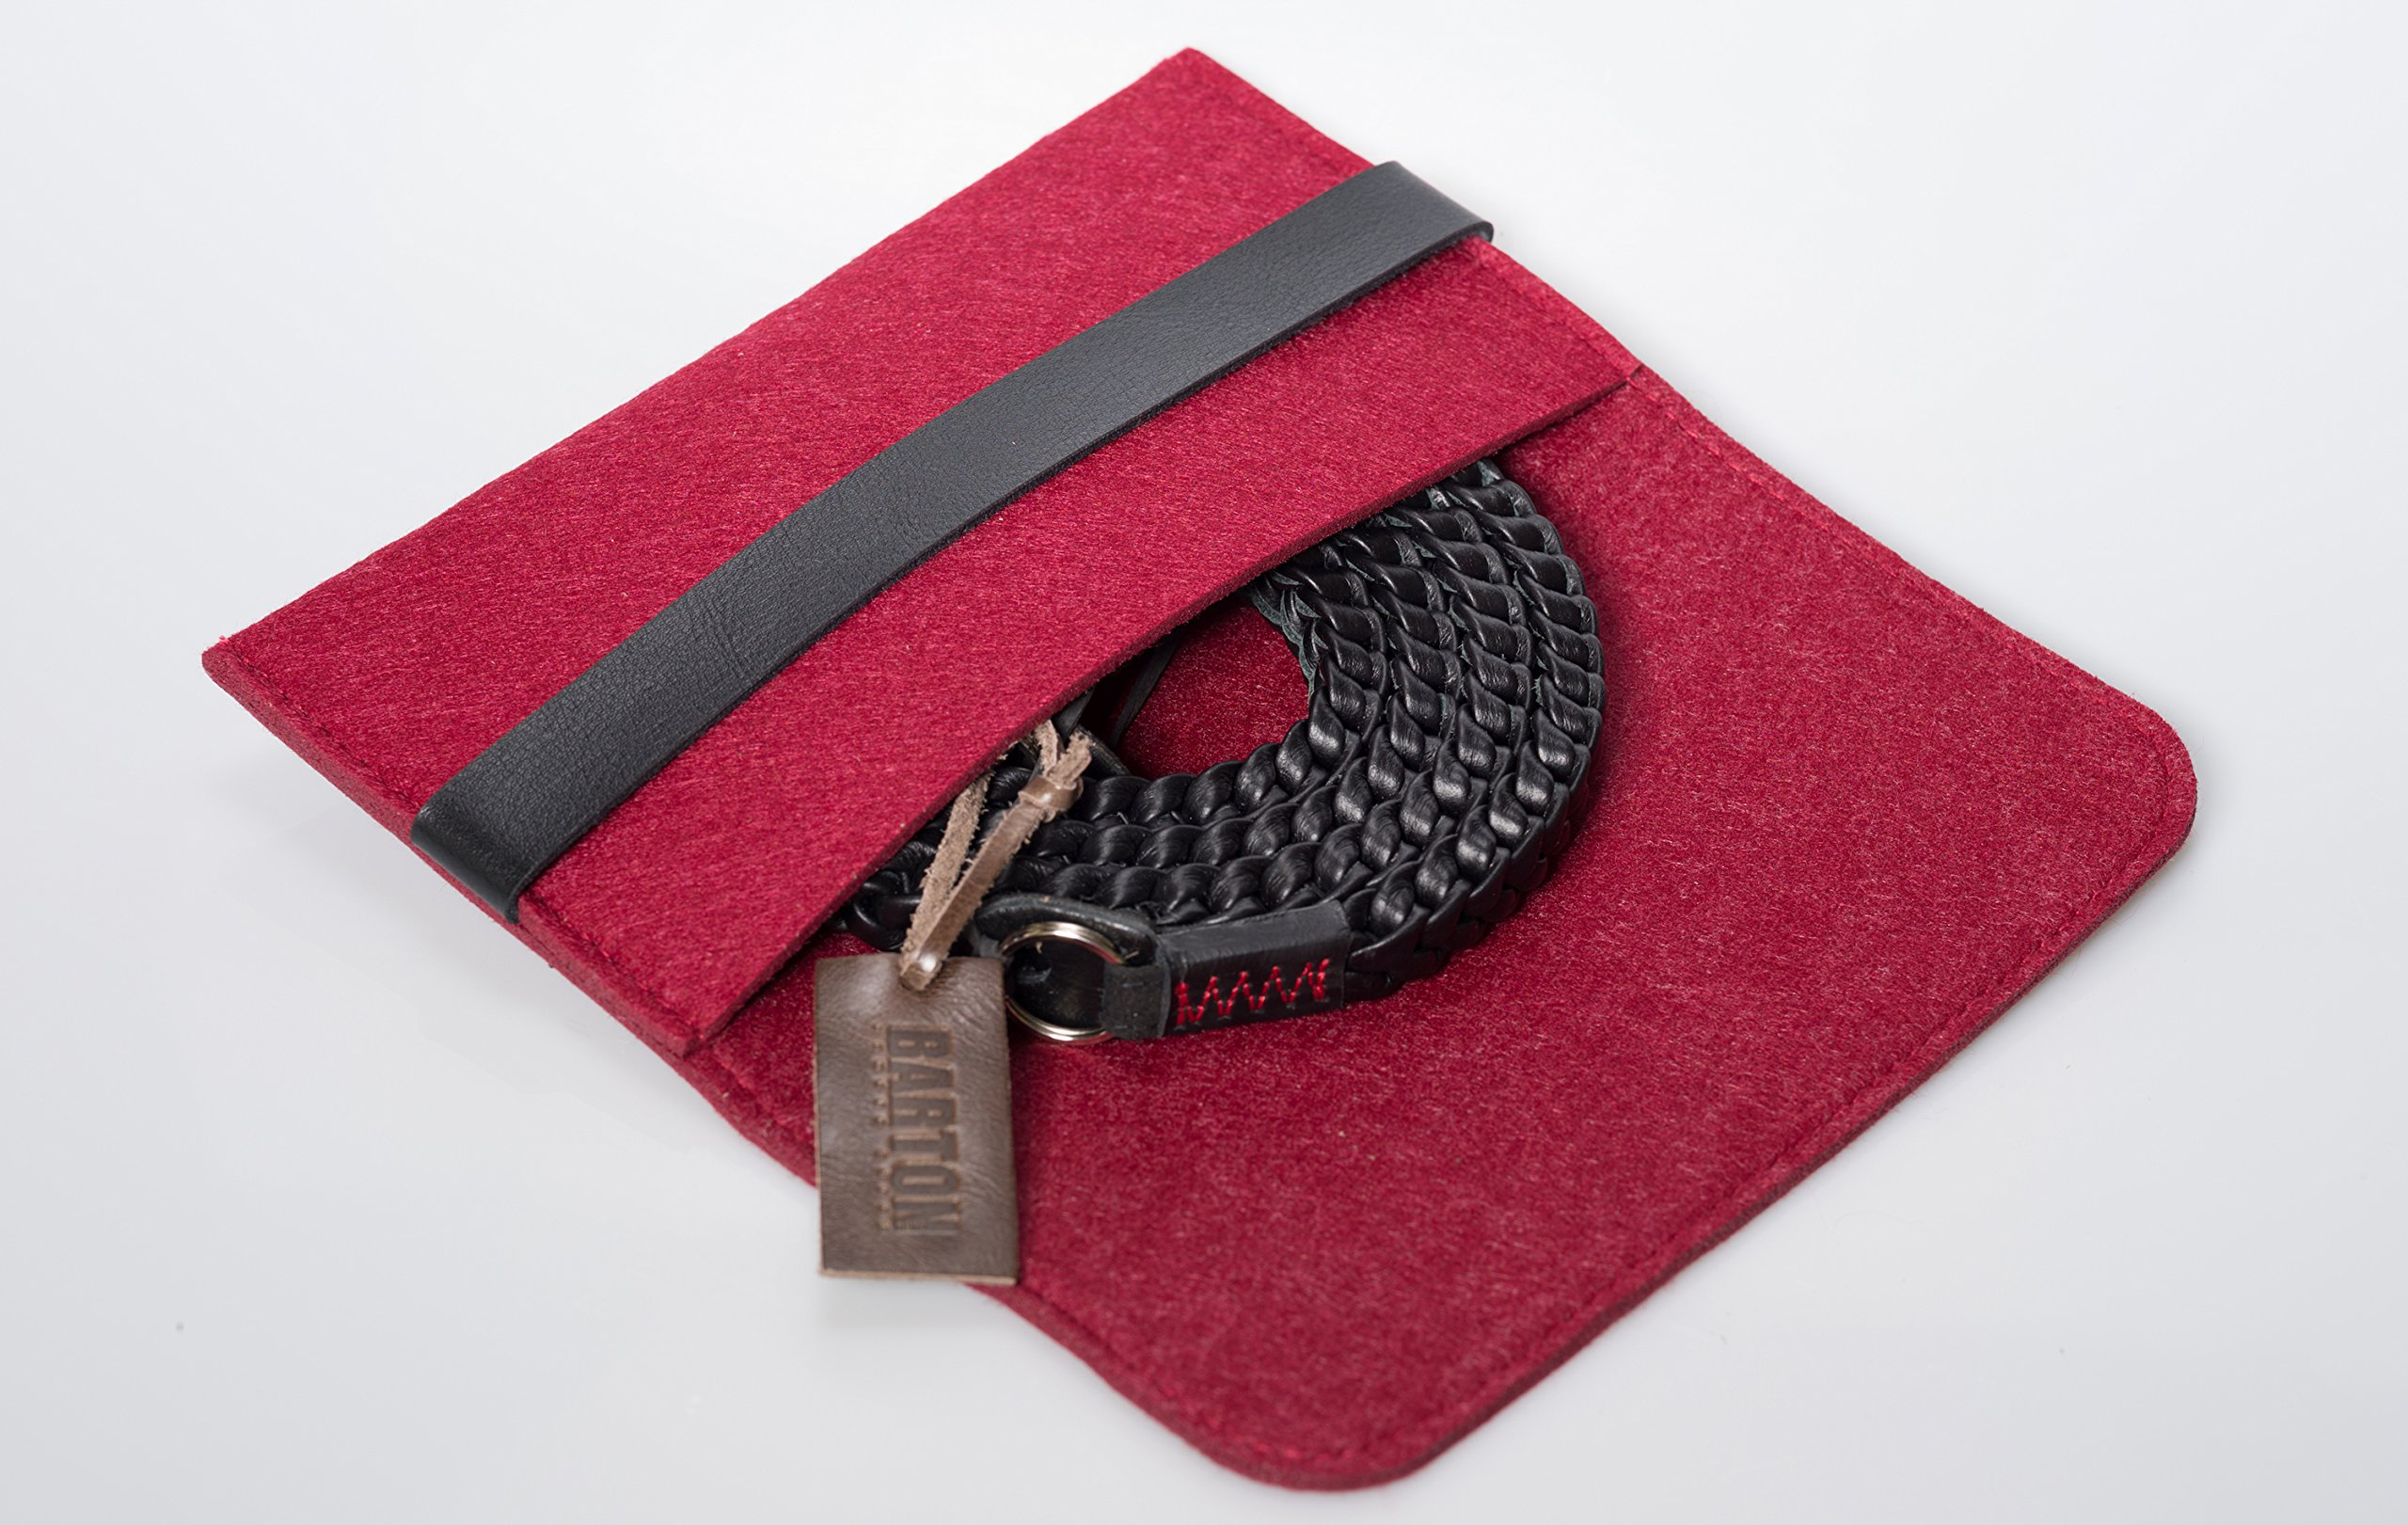 Barton 1972 Pitch Black Braided Leather 1972 XL 50'' (125cm) Leica Sony Fuji Luxury Designer Barton1972 Top Grain Leather by Barton 1972 (Image #7)